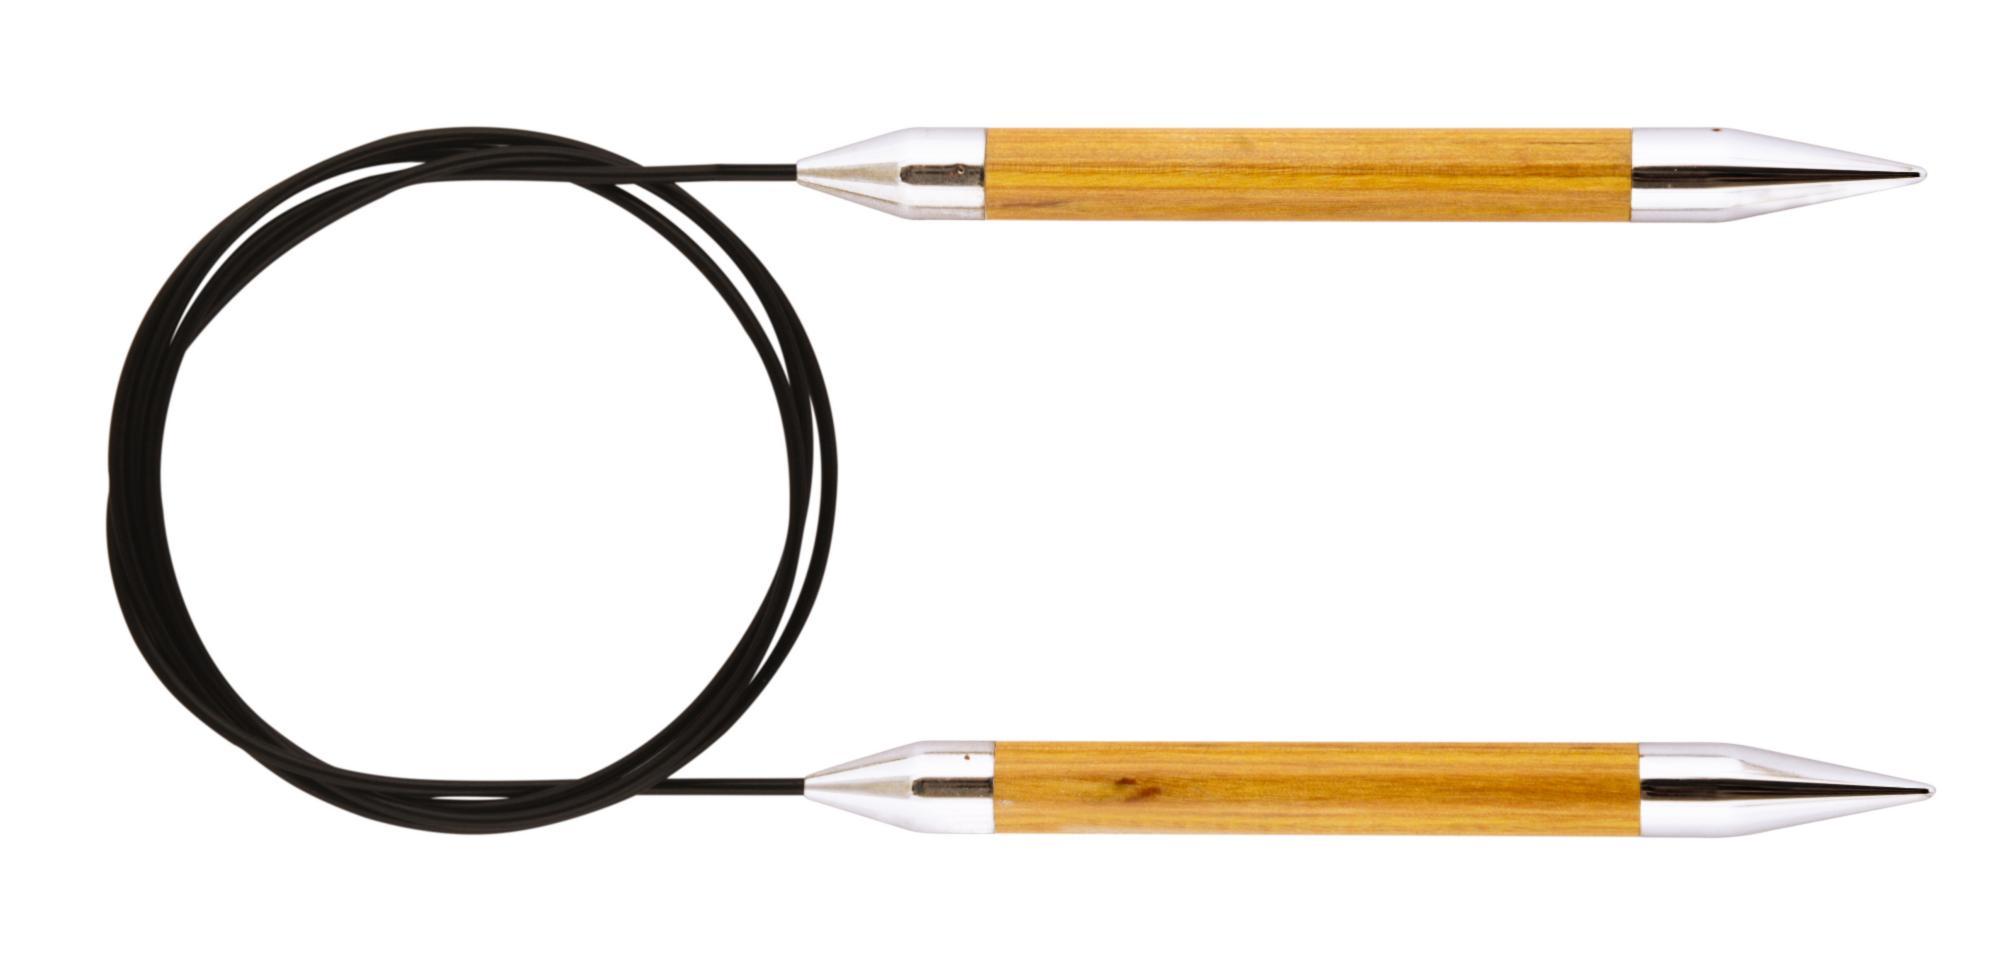 Спицы круговые 60 см Royale KnitPro, 29085, 12.00 мм